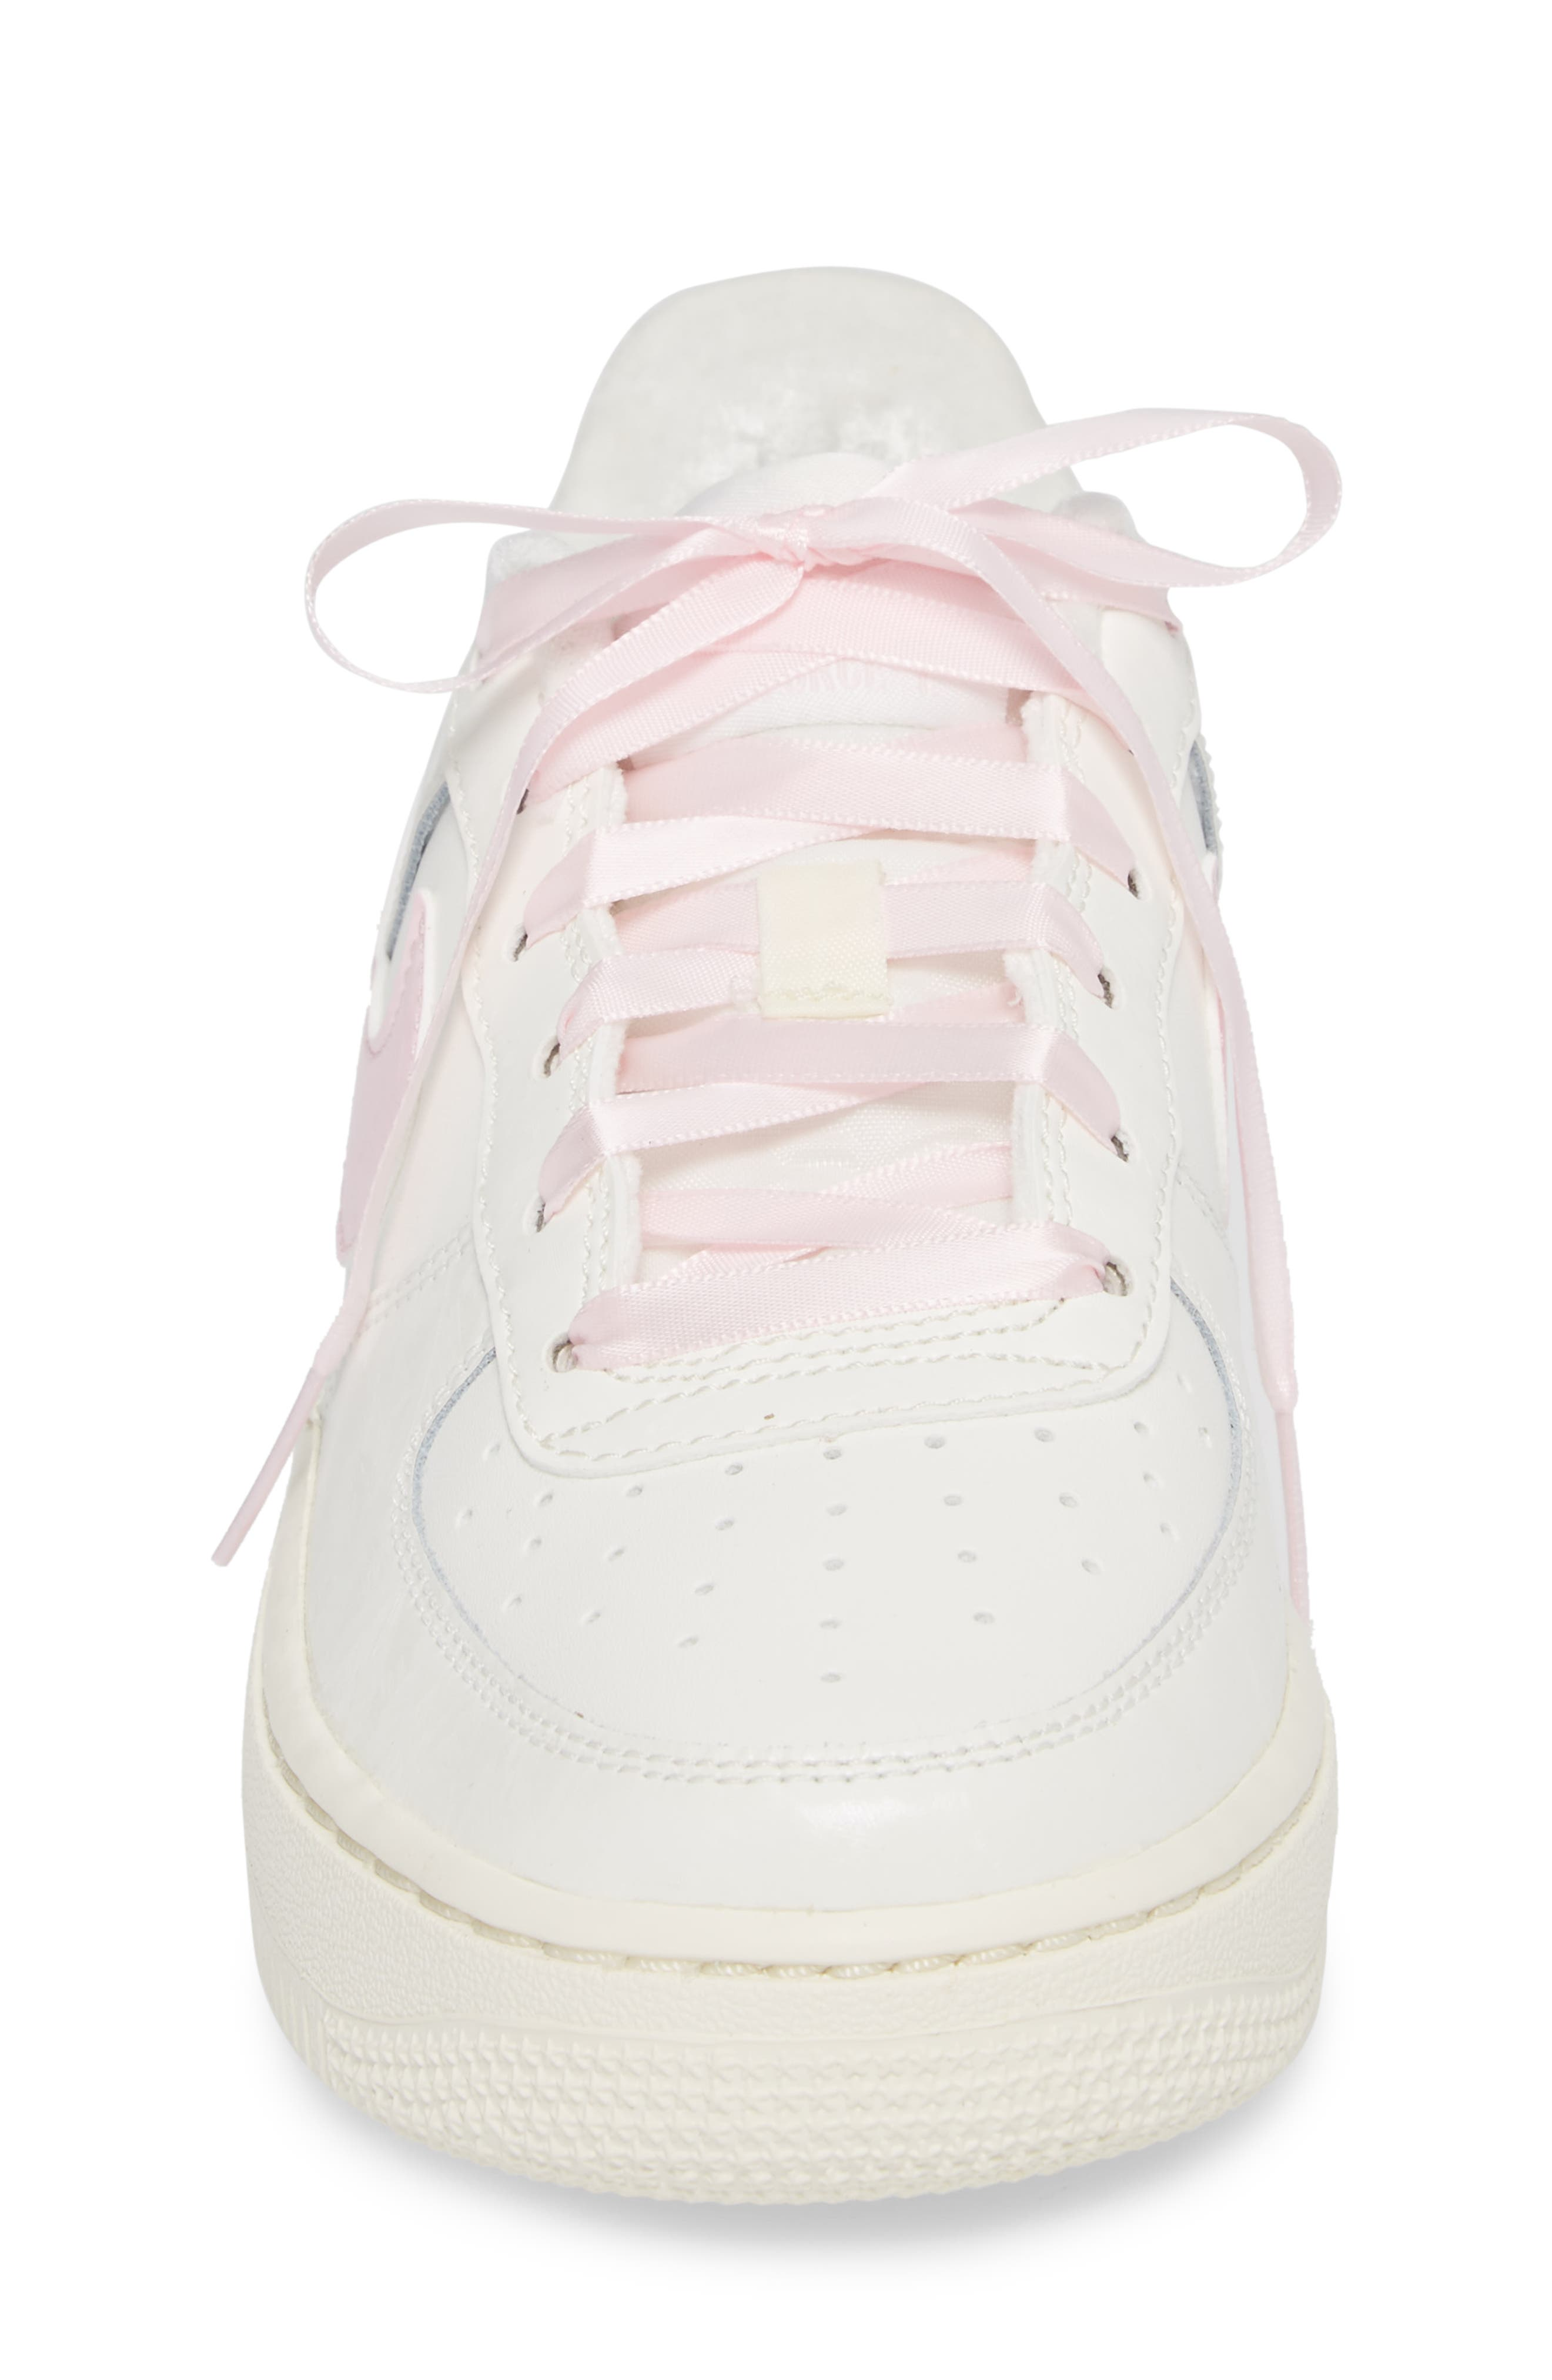 Air Force 1 '06 Sneaker,                             Alternate thumbnail 4, color,                             Sail/ Arctic Pink